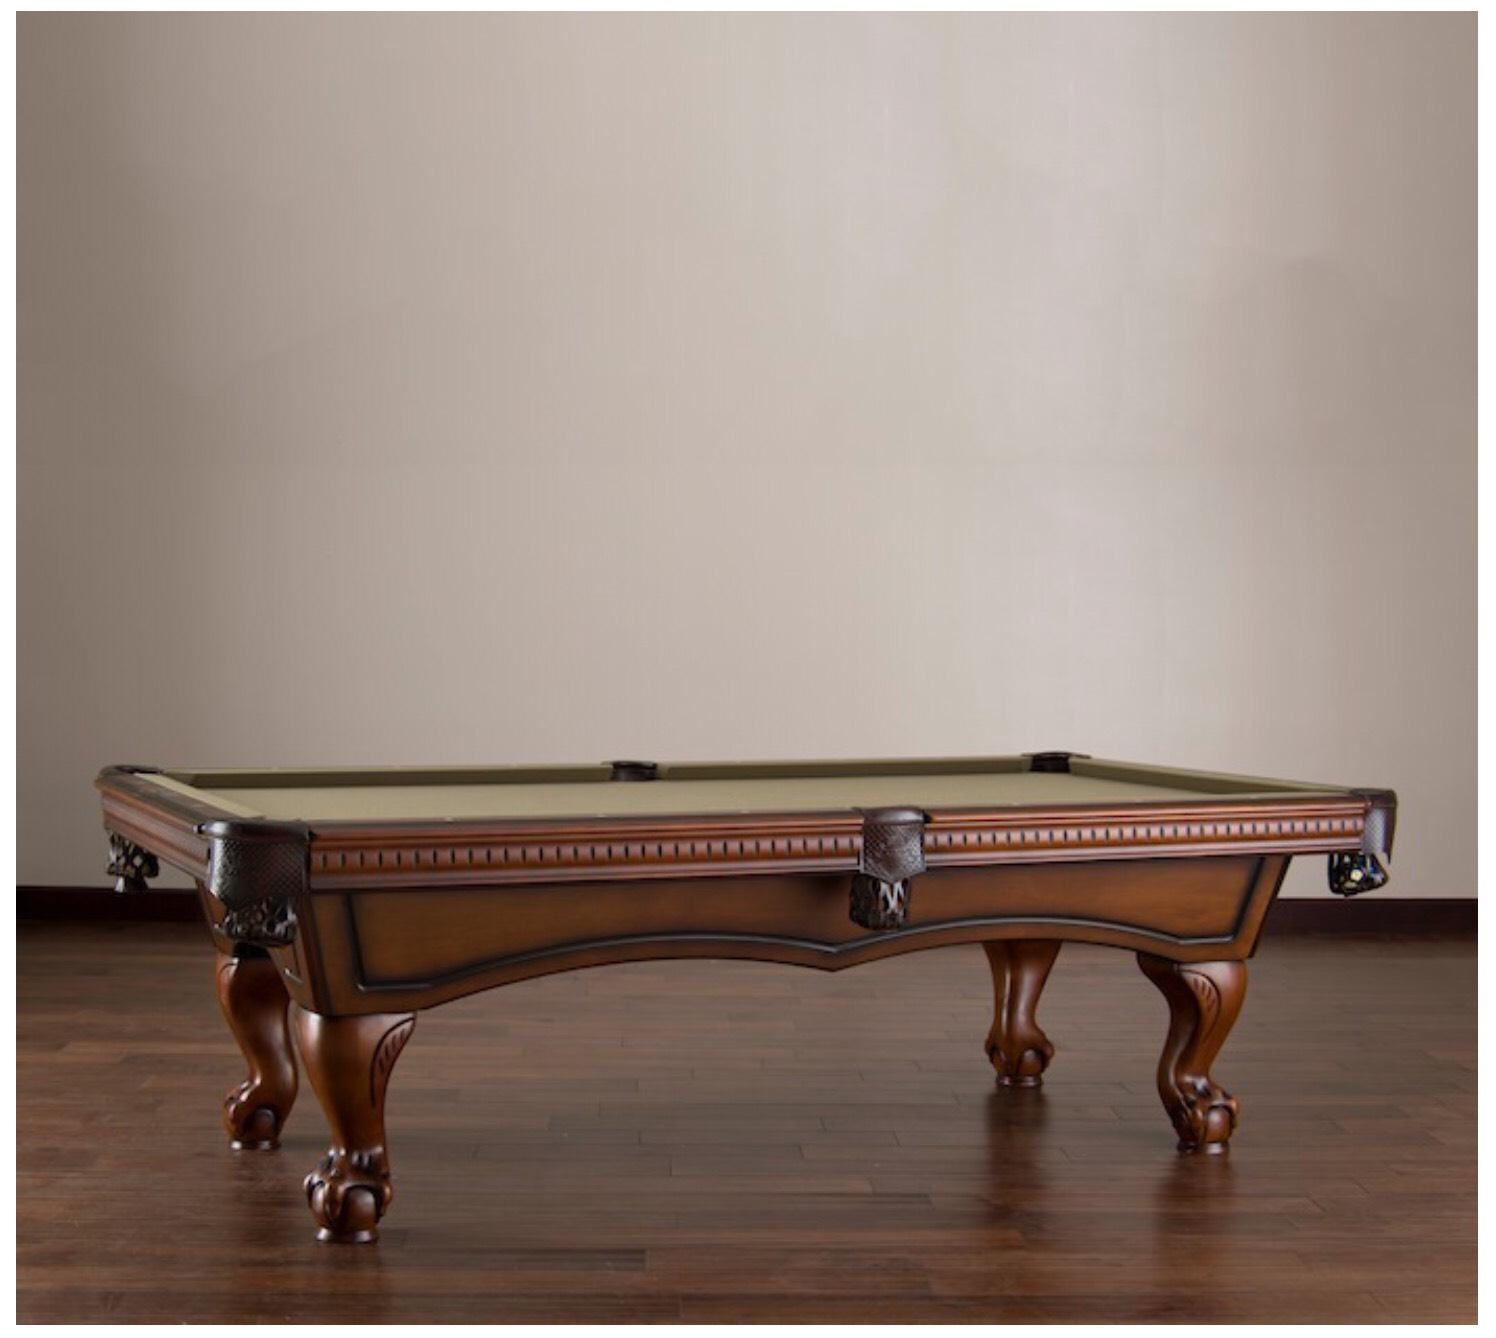 Artero Diamondback Billiards Shopping Cart